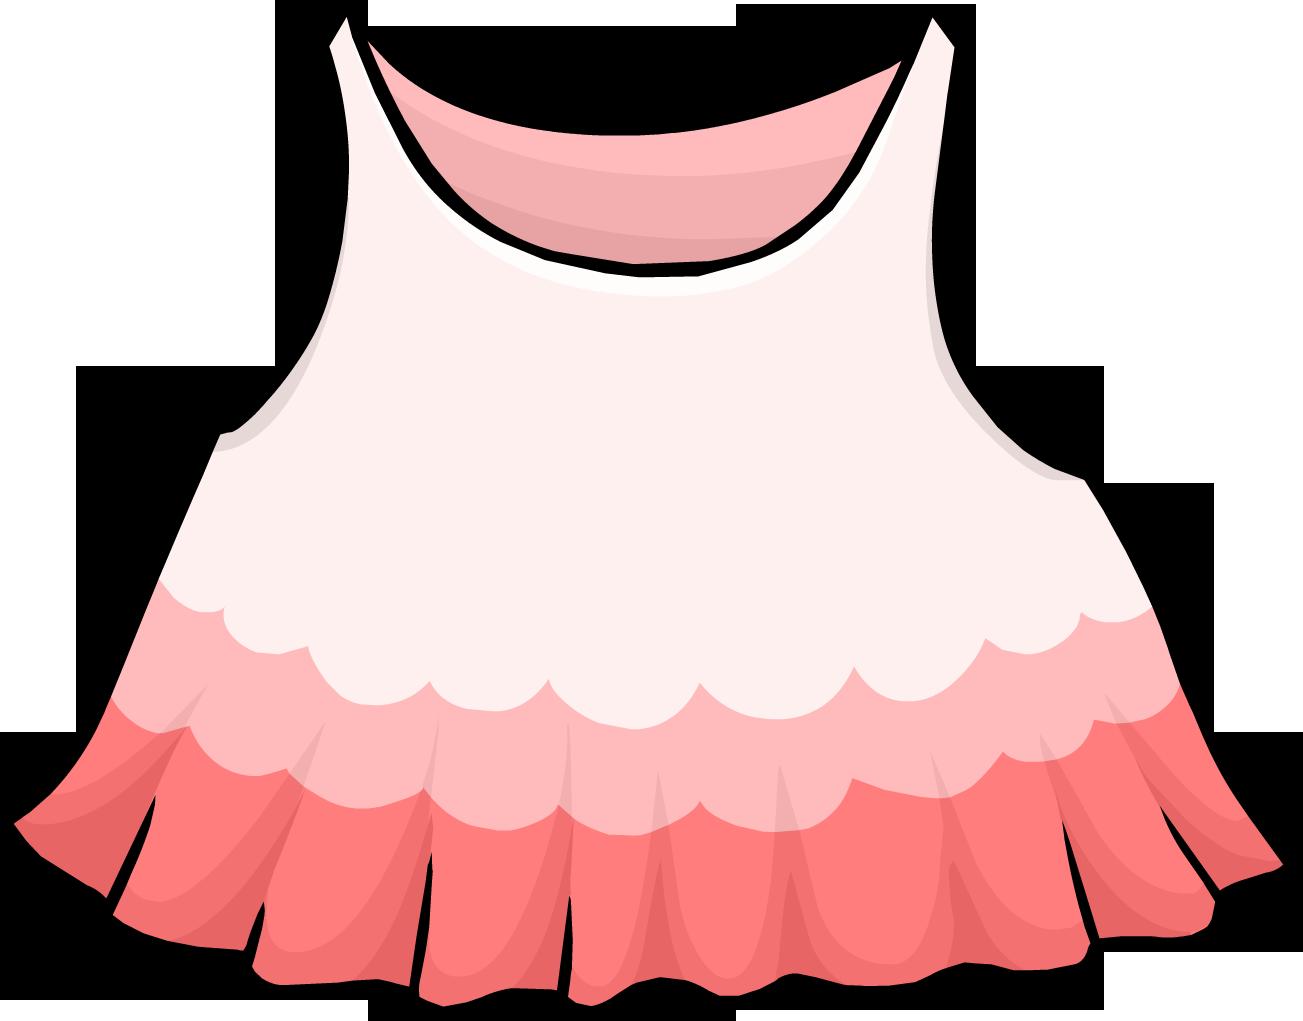 Clothing clipart pink dress. Club penguin wiki fandom